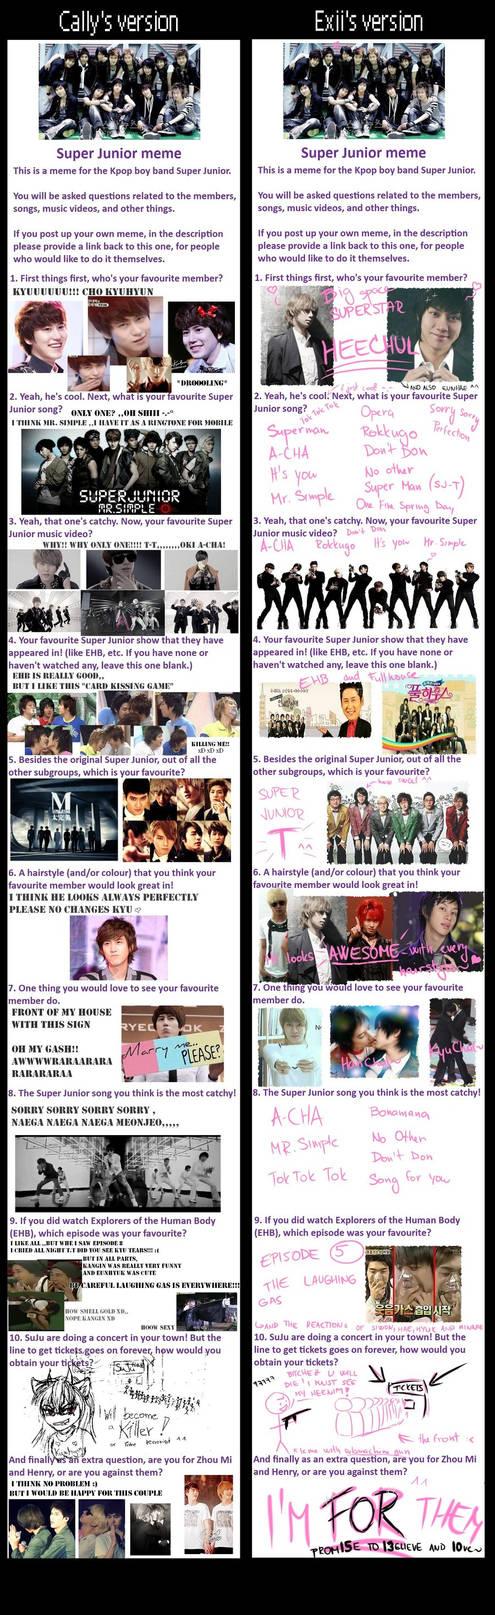 Super Junior::double meme by Cally-Dream on DeviantArt